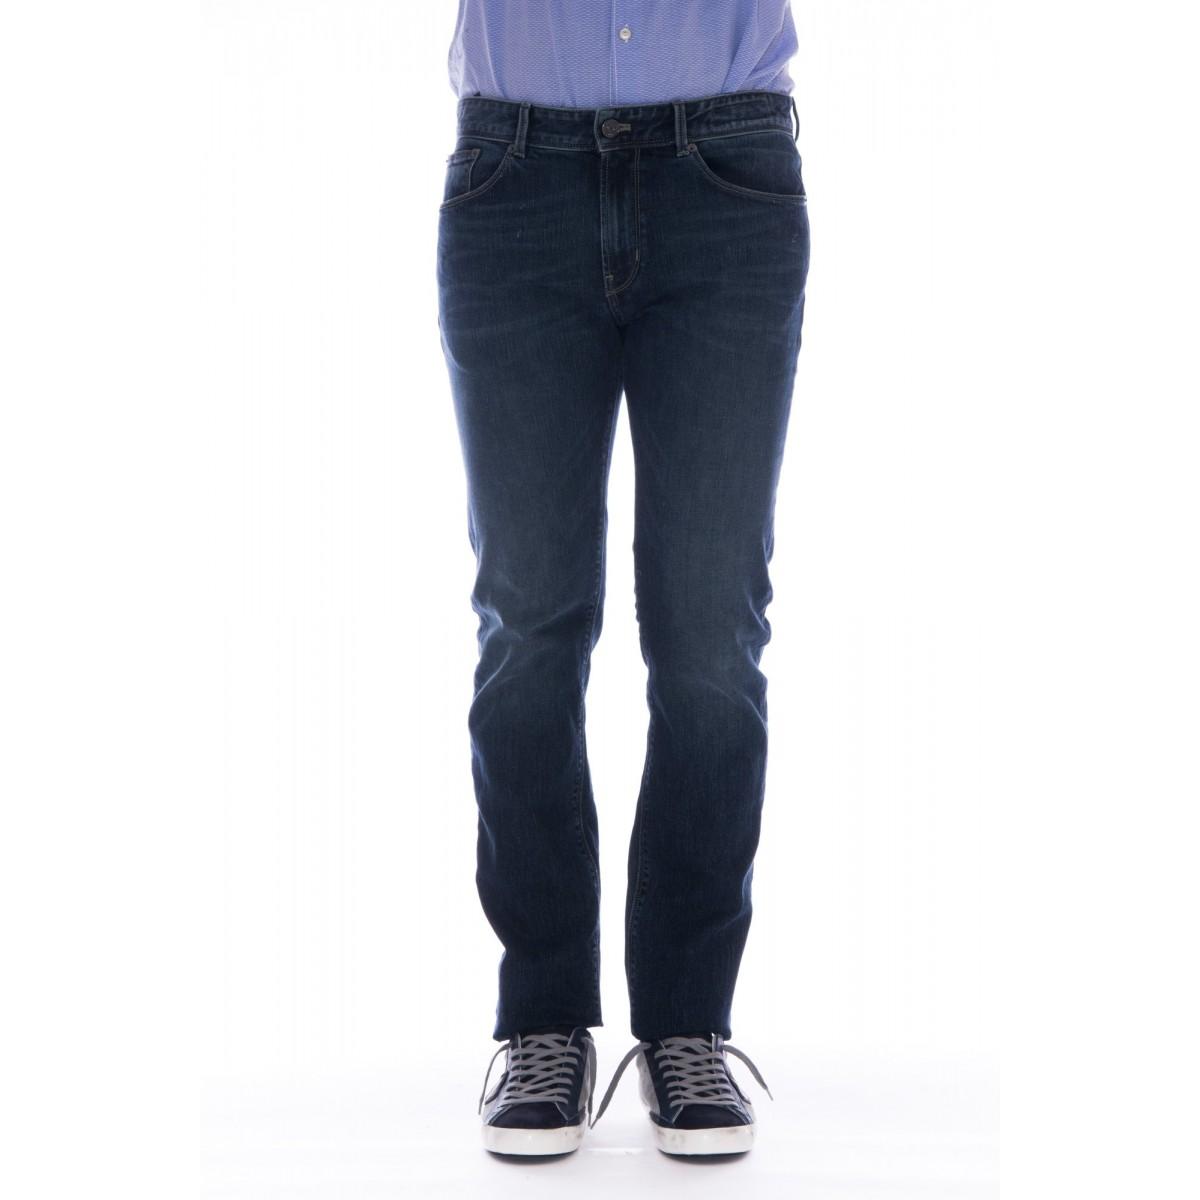 Jeans Pt 05 - C526w3 gp01 jeans super slim